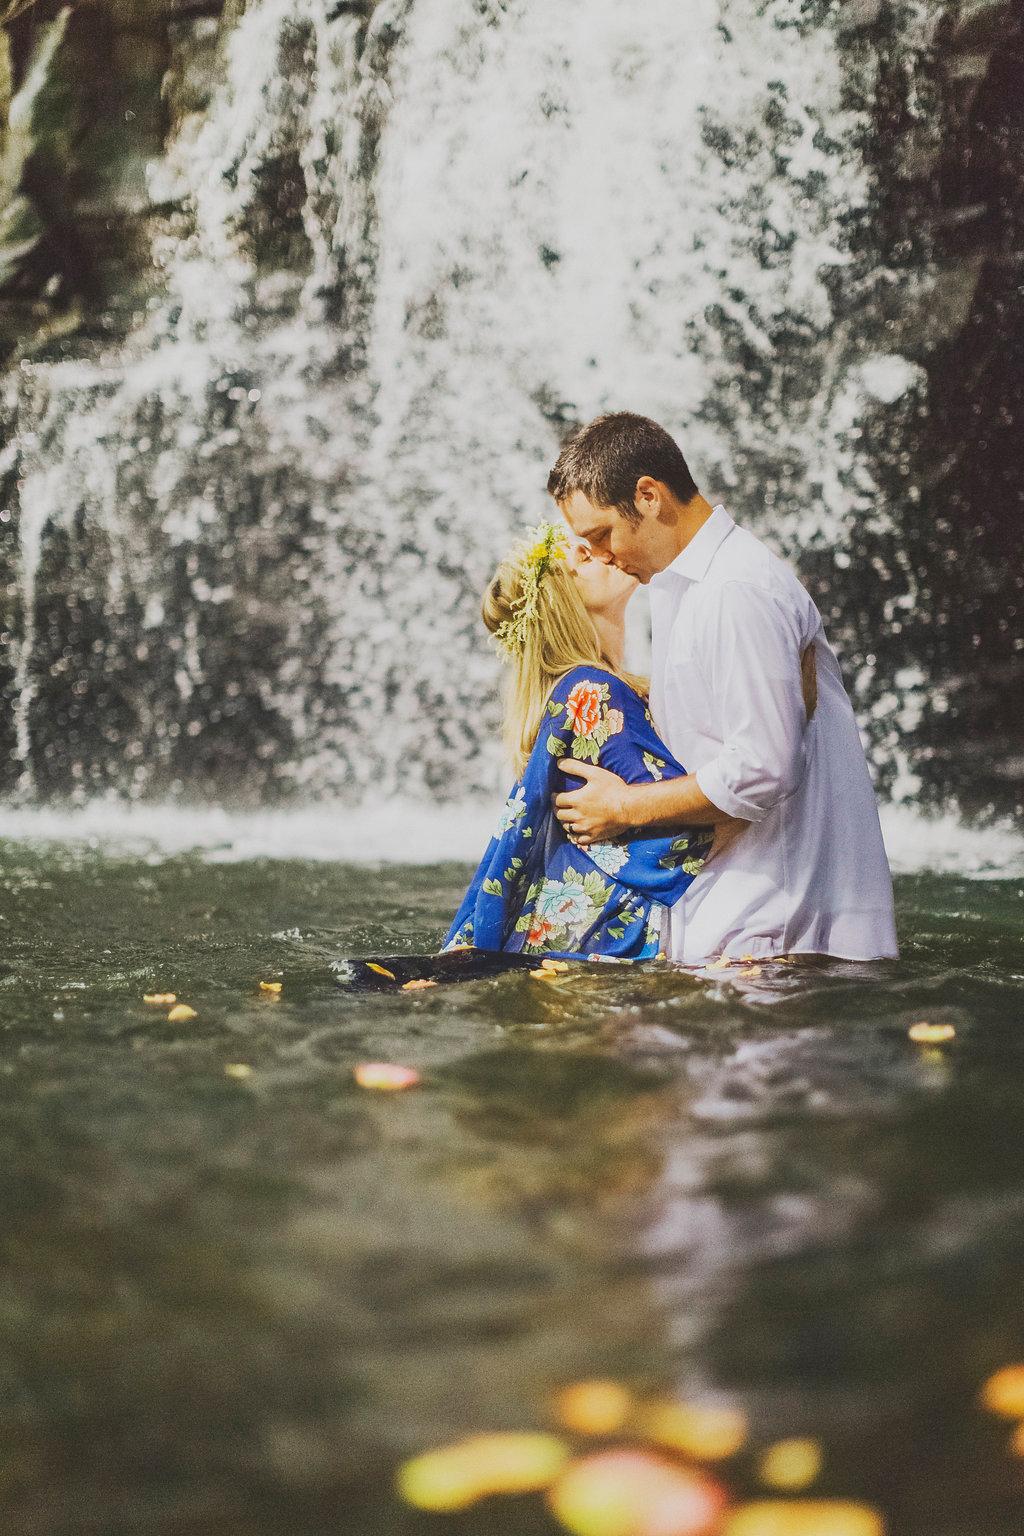 angie-diaz-photography-crisna-brandon-day-after-wedding-20.jpg